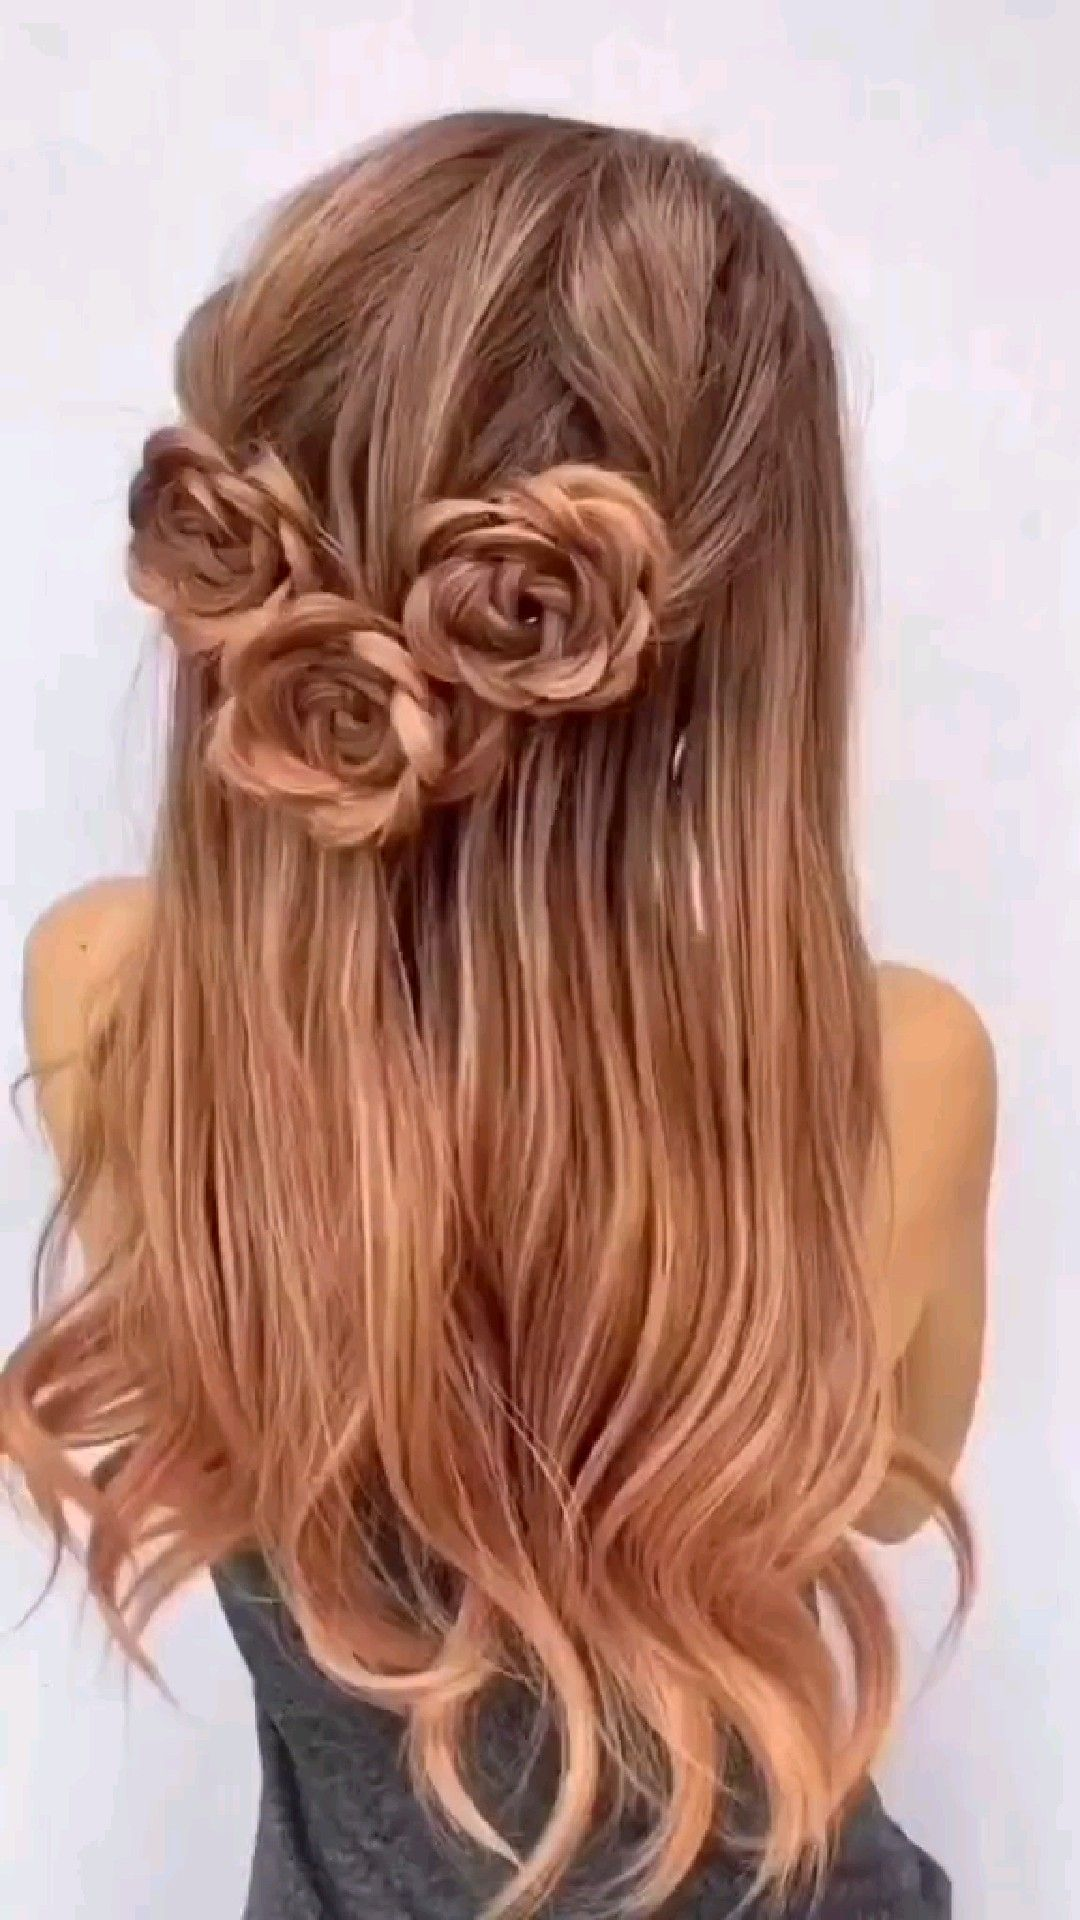 Easy, Beautiful and Trendy Hairstyles?!❤ Do u like